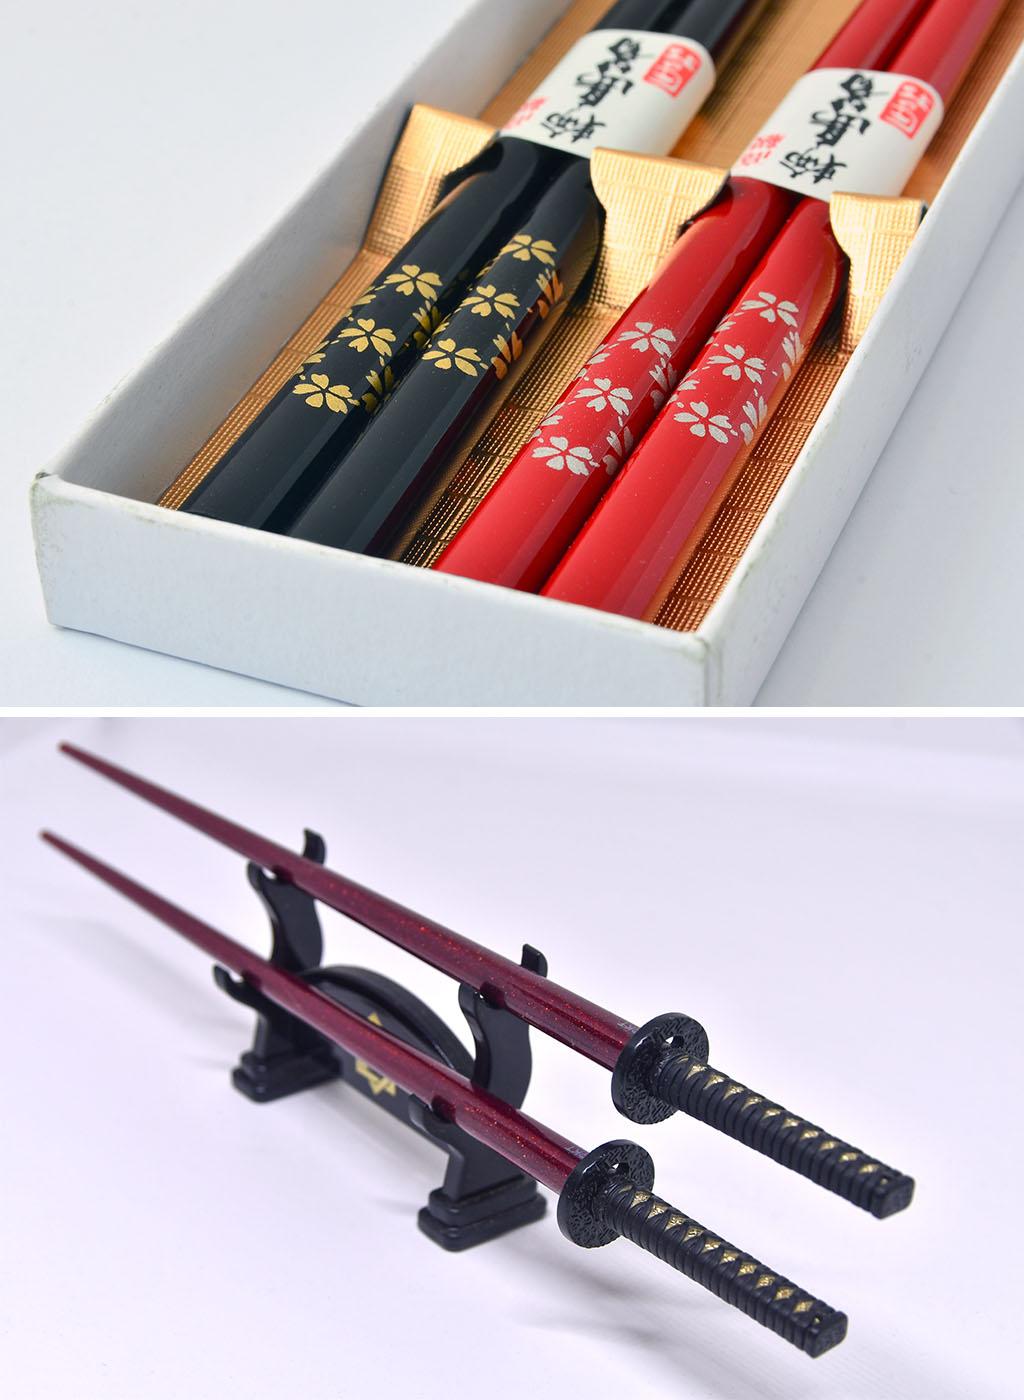 Hashi I.E. Chopsticks